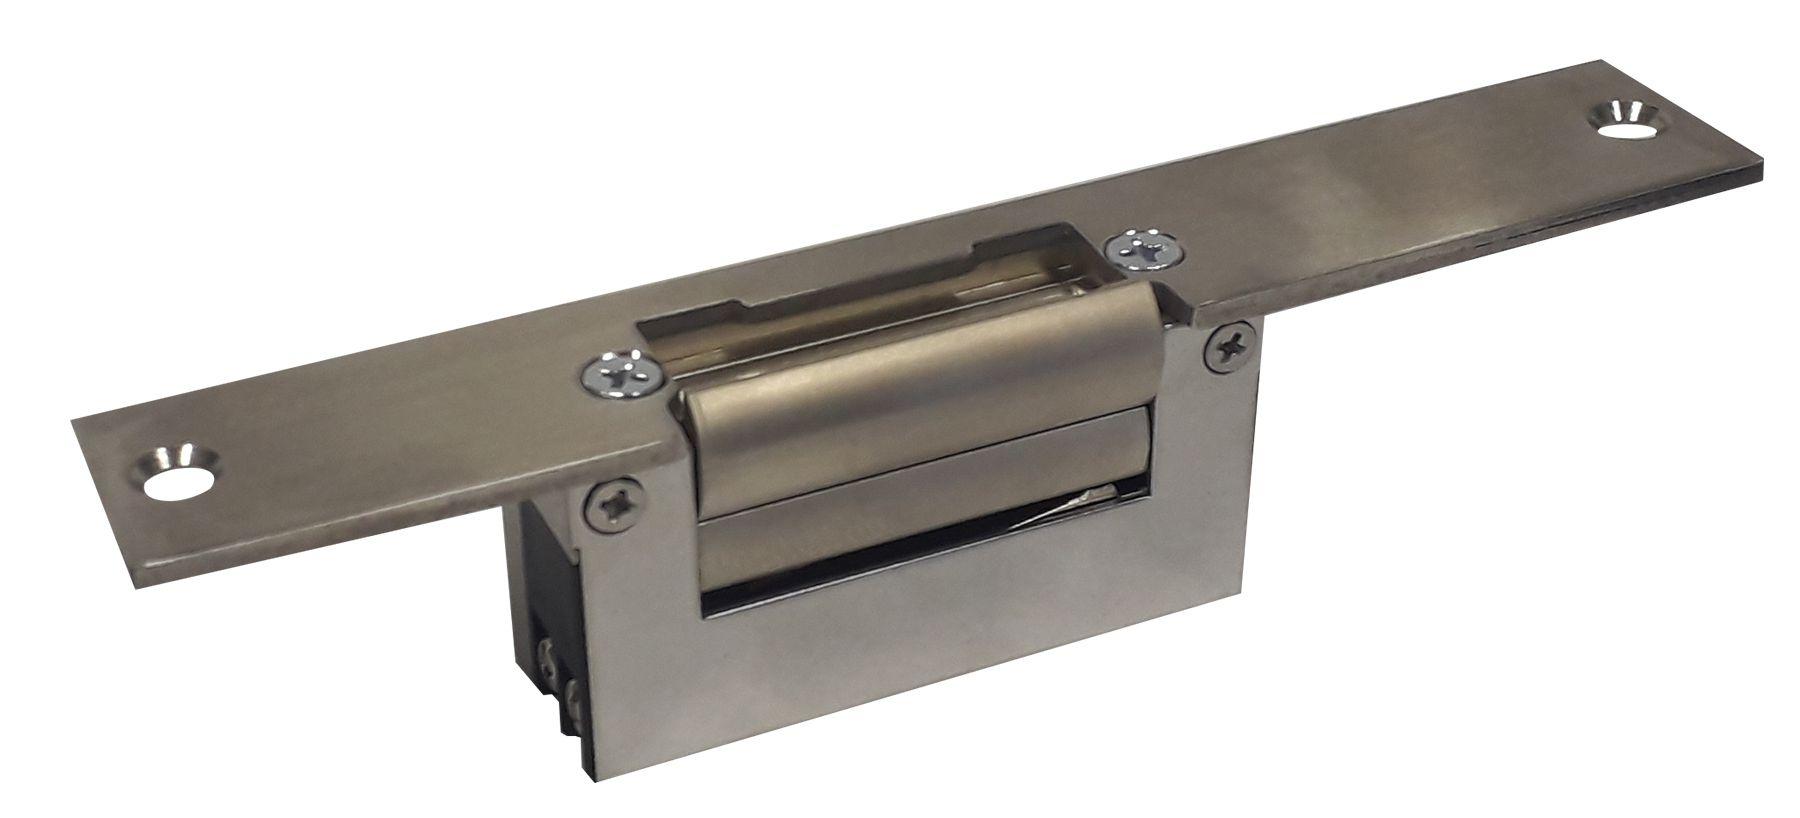 Fecho Elétrico - Magnético Dovale Curto D-10 - 40087